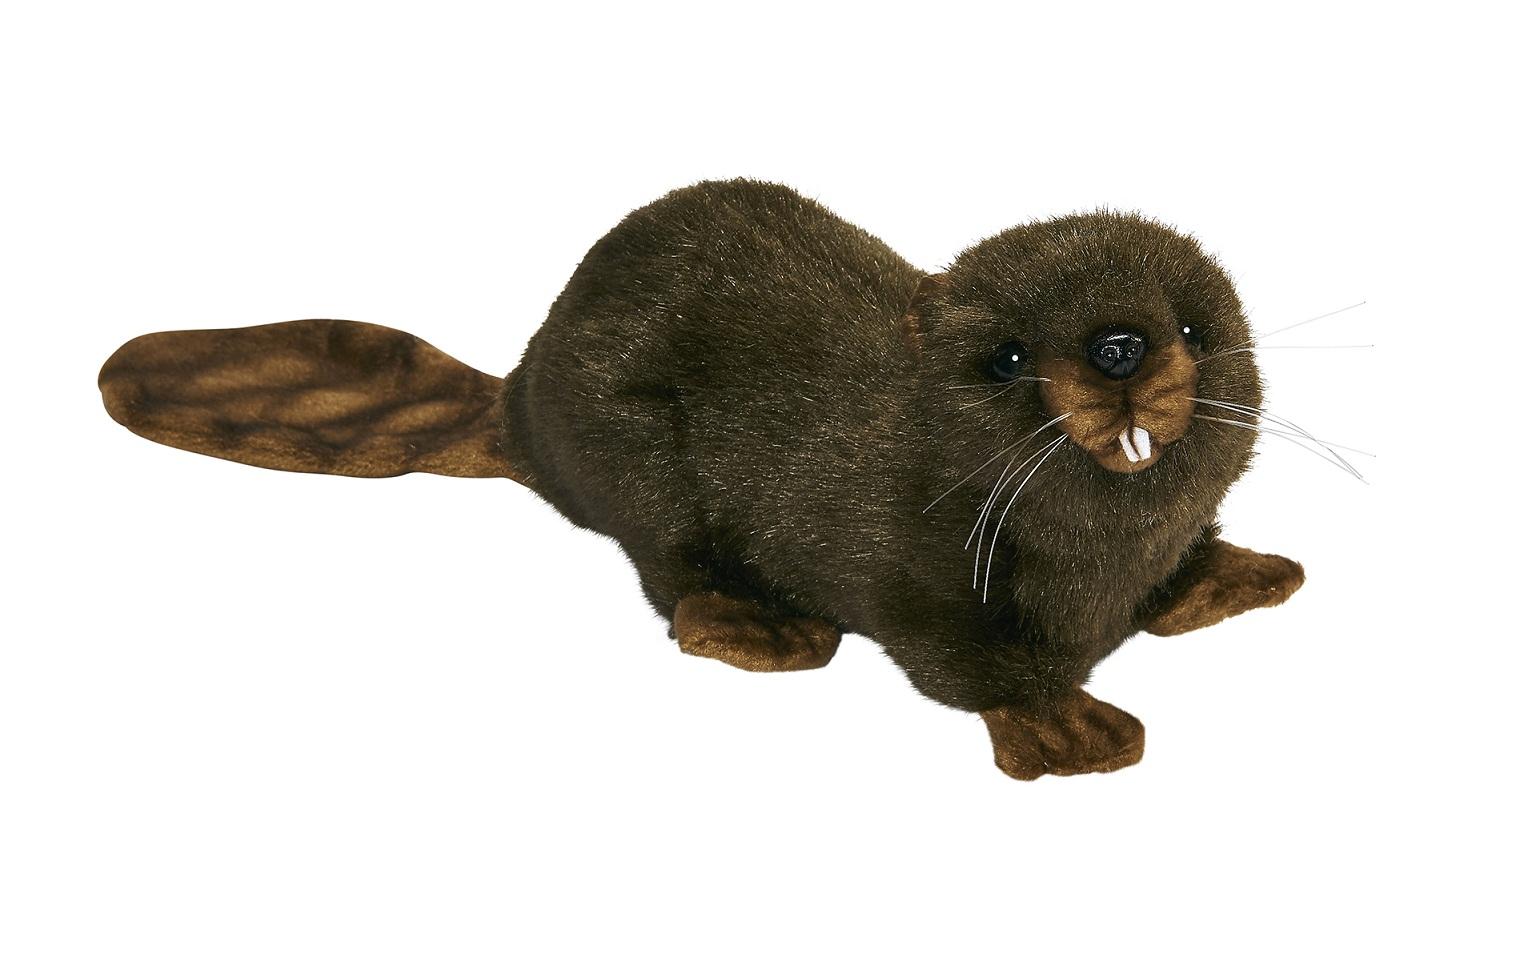 Мягкая игрушка – Бобер, 20 смДикие животные<br>Мягкая игрушка – Бобер, 20 см<br>